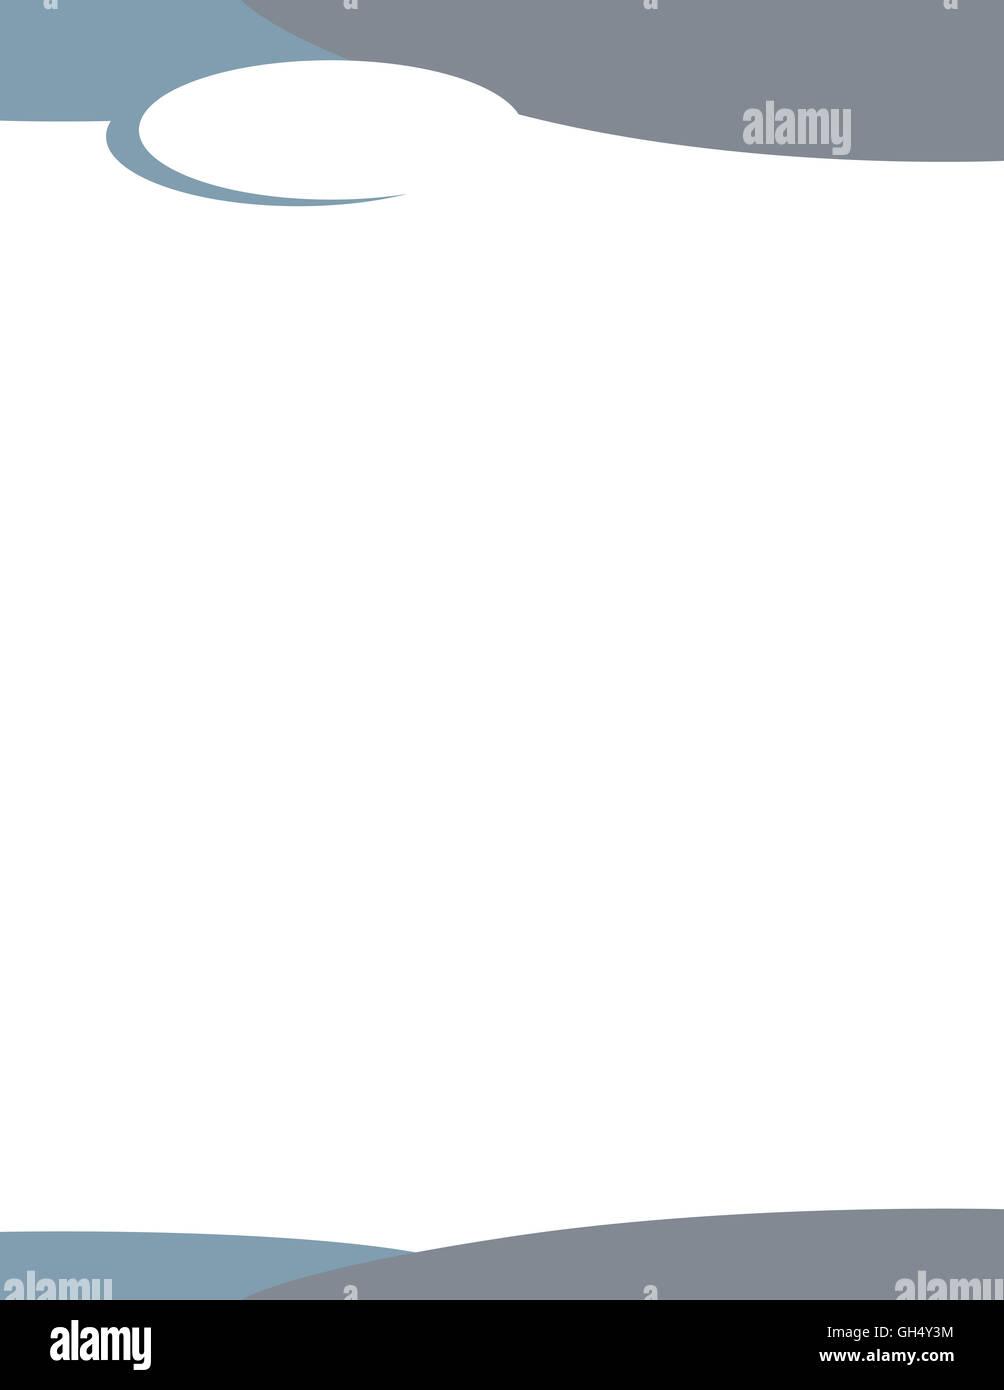 Swirl Letterhead Template Logo Blue Grey - Stock Image